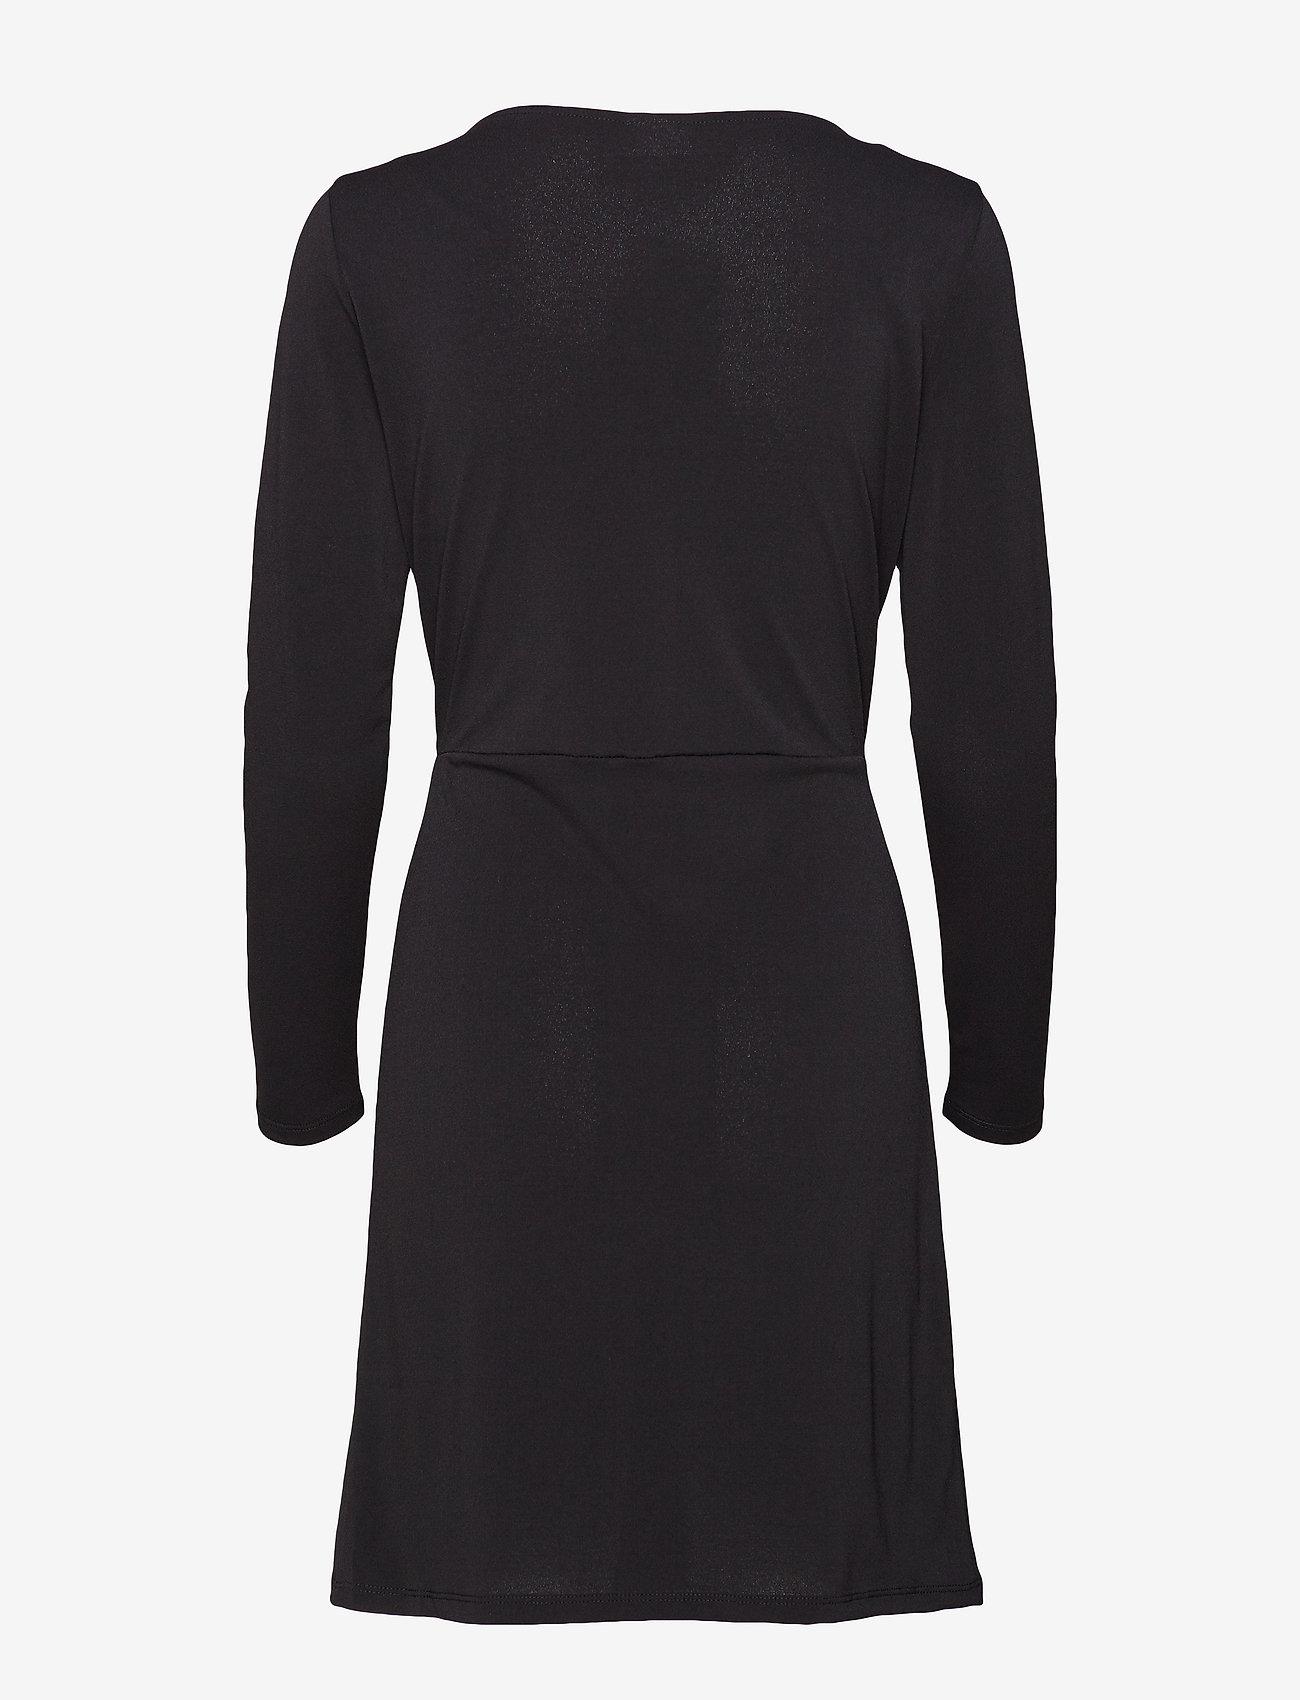 Vila - VICLASSY L/S DETAIL DRESS - NOOS - short dresses - black - 1